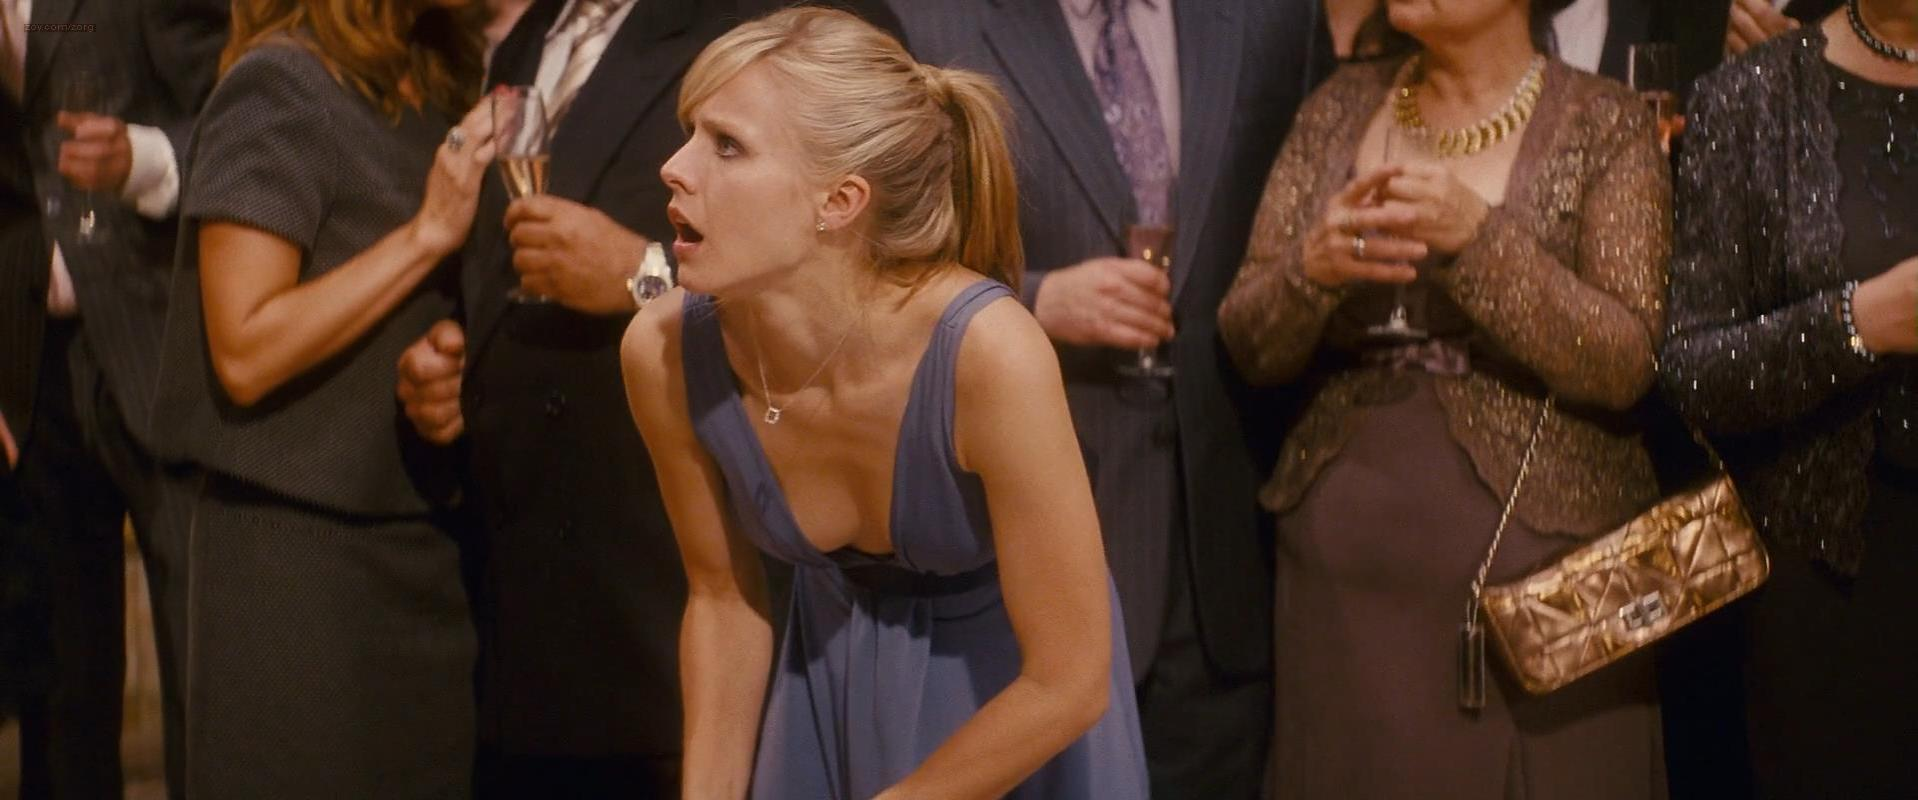 Kristen Bell sexy - When In Rome (2010)